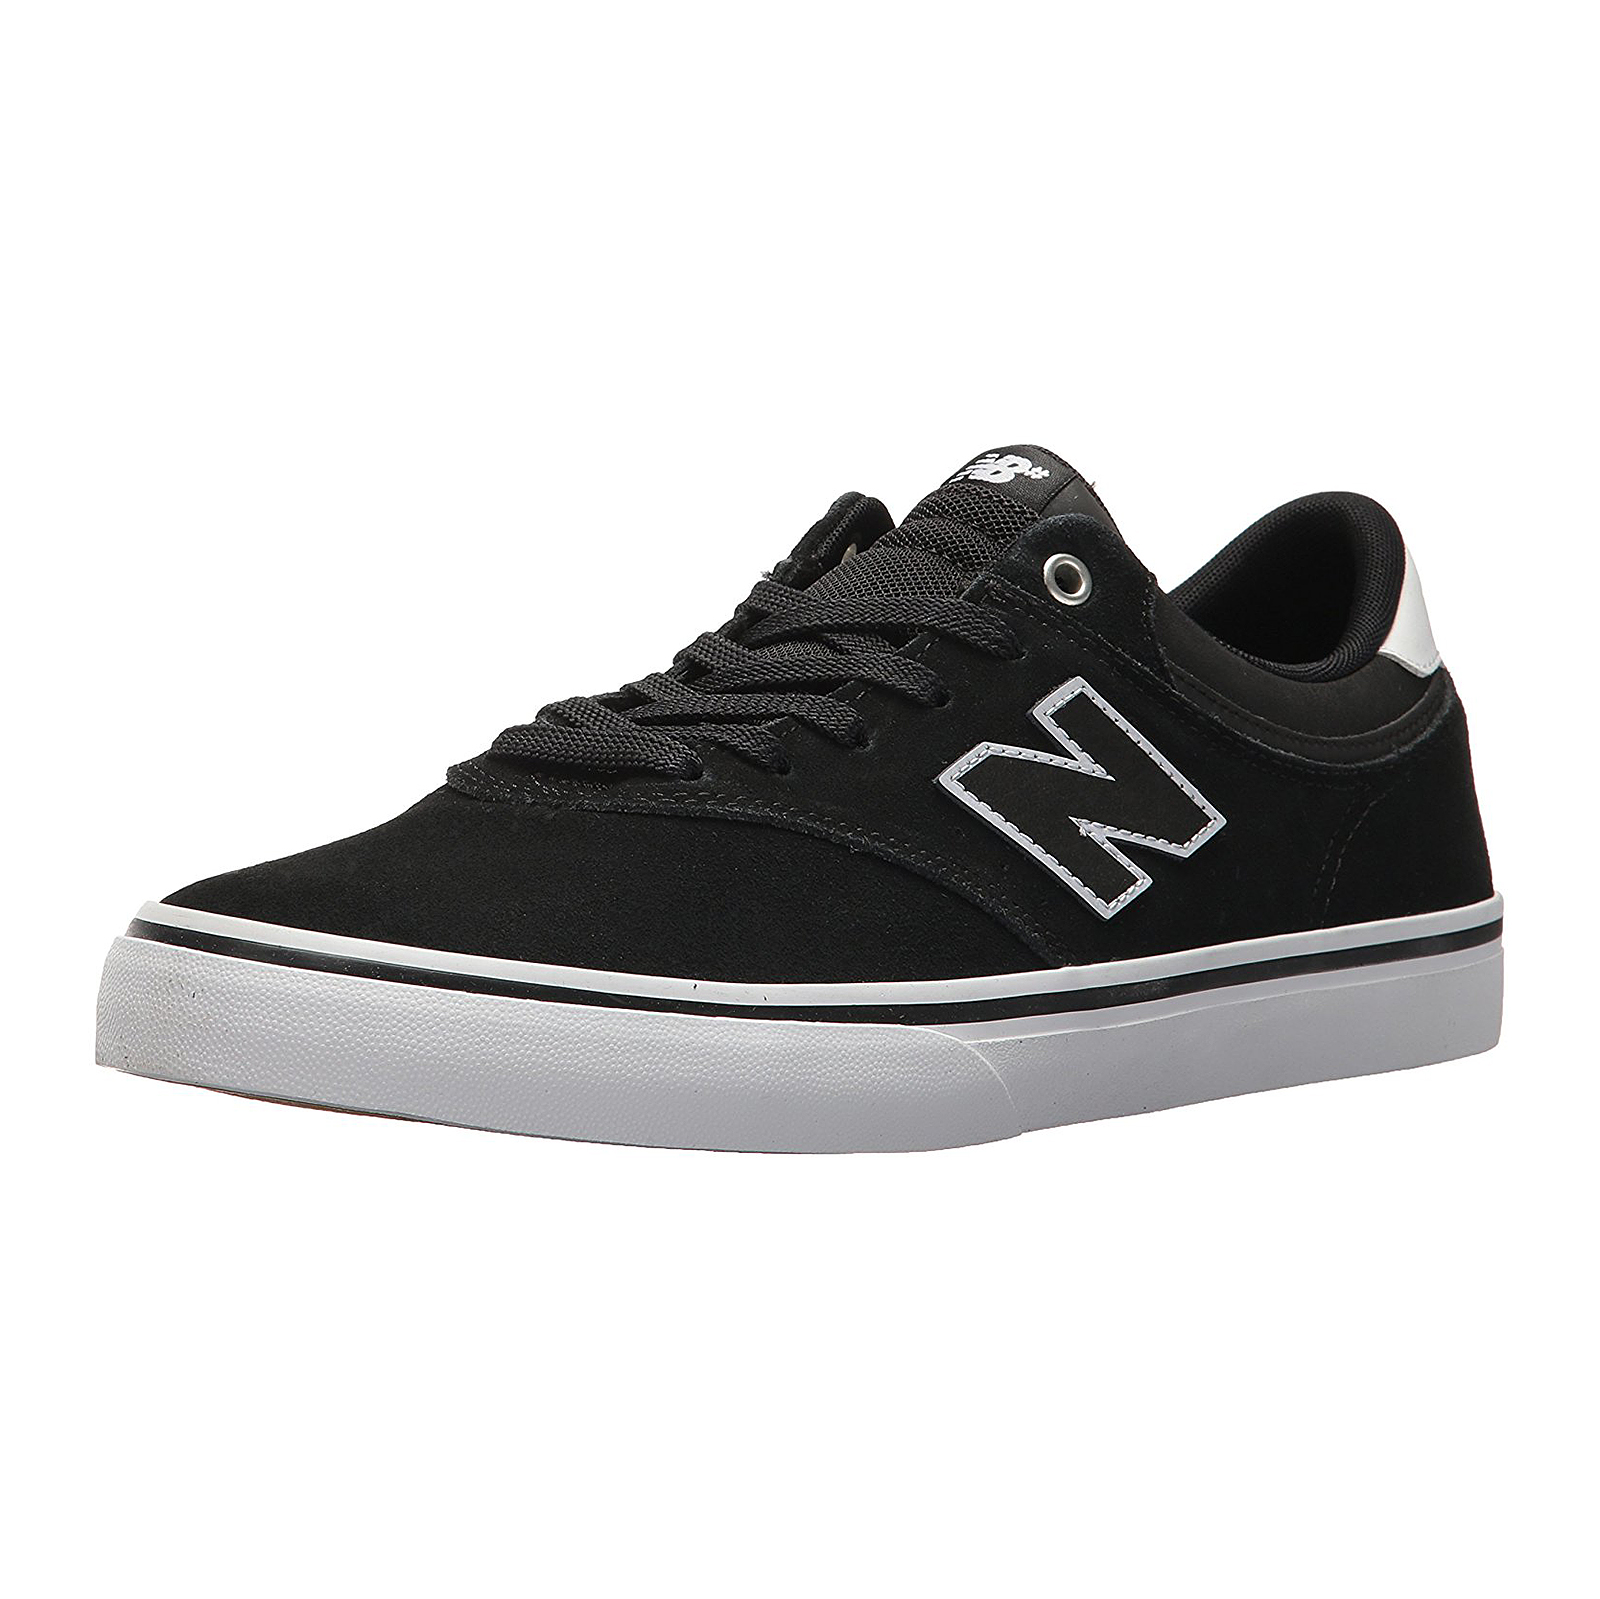 New Balance Sneakers Numeric Skateboarding Noir/Blanc Suede Nero